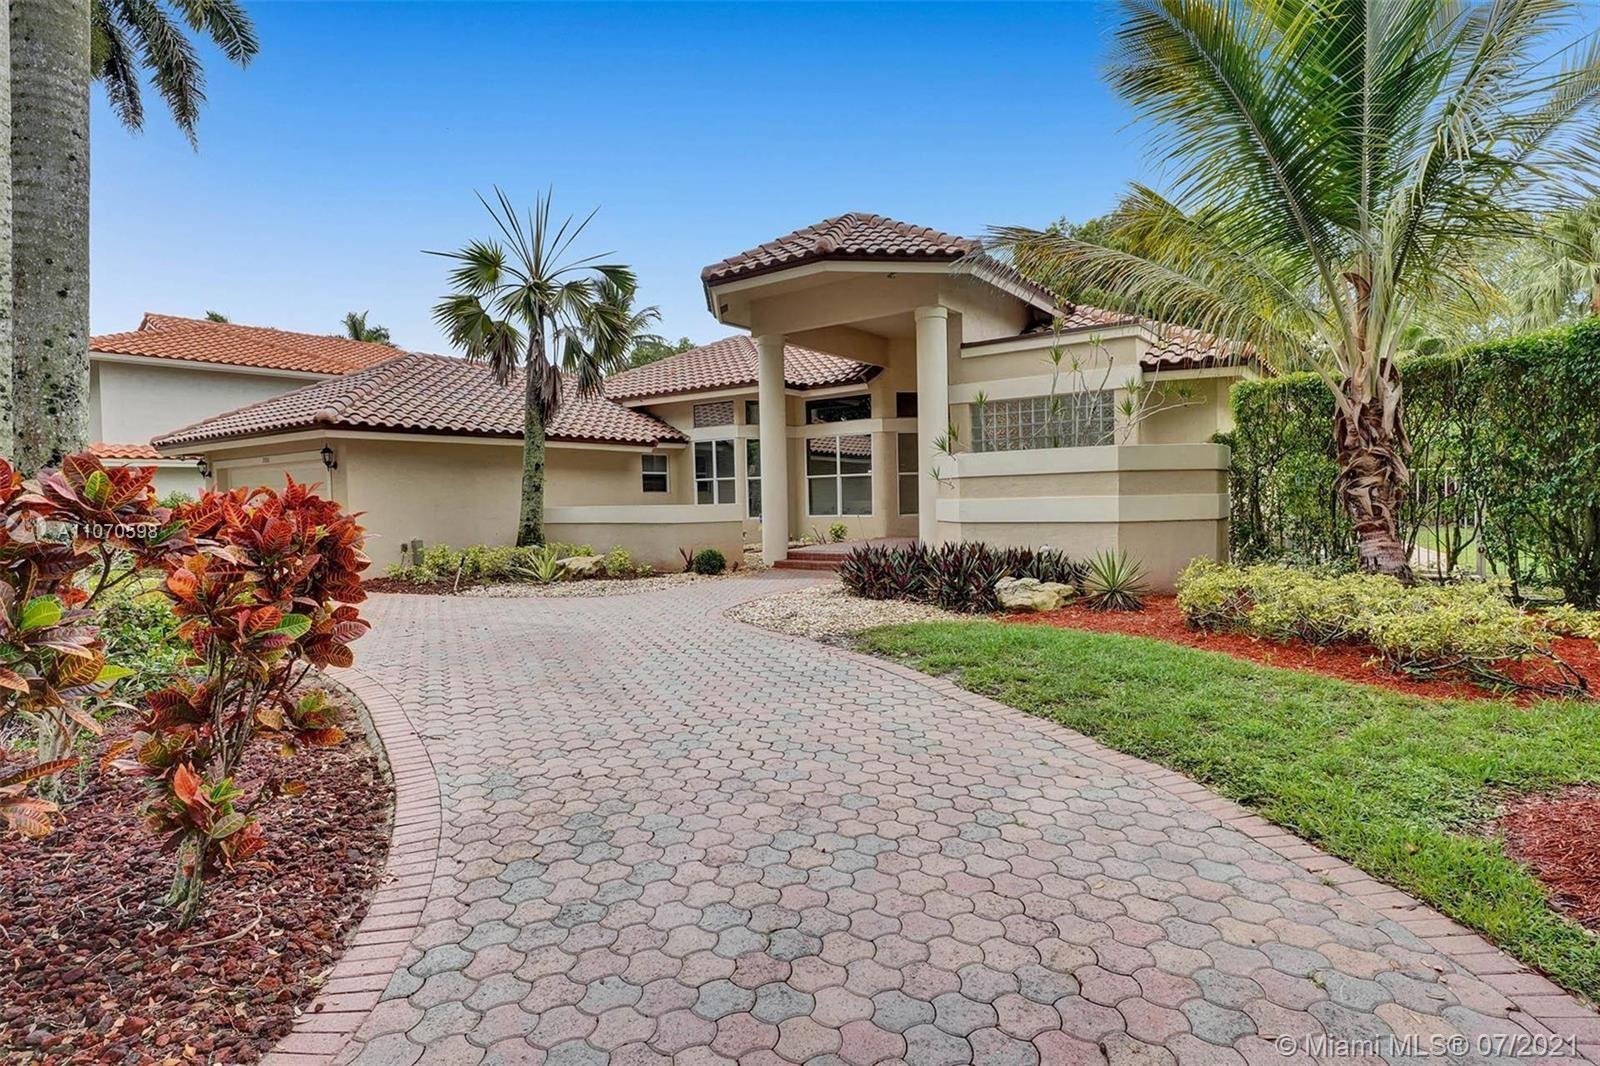 Photo of 3500 Washington Lane, Cooper City, FL 33026 (MLS # A11070598)